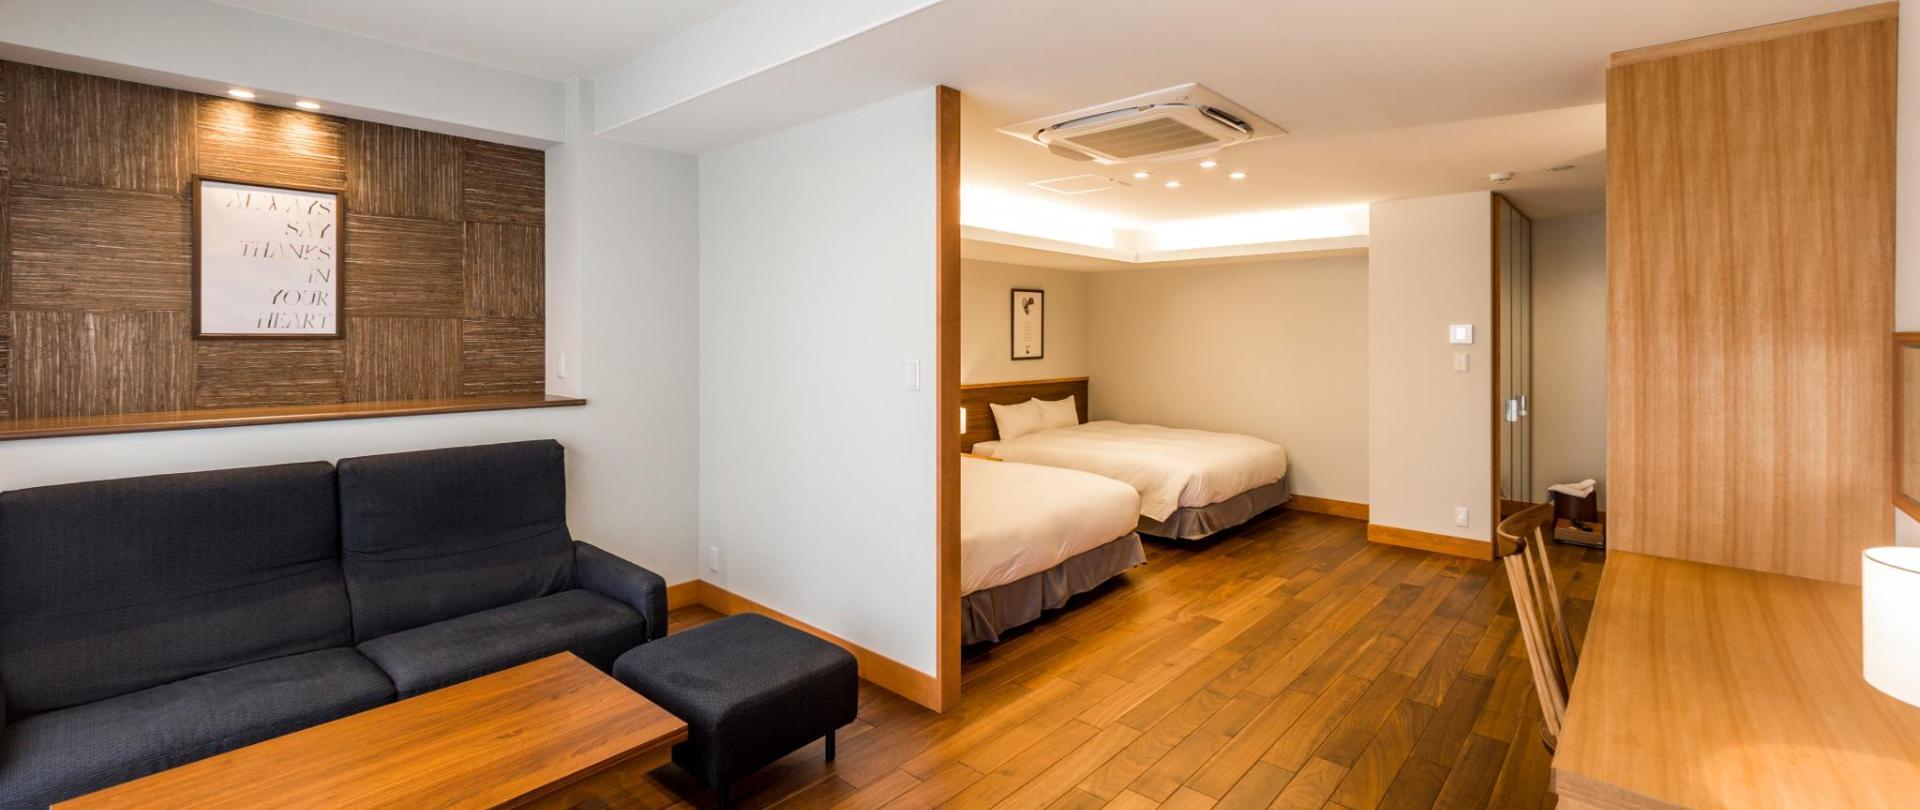 OOKINI HOTELS Yotsubashi Horie Apartment